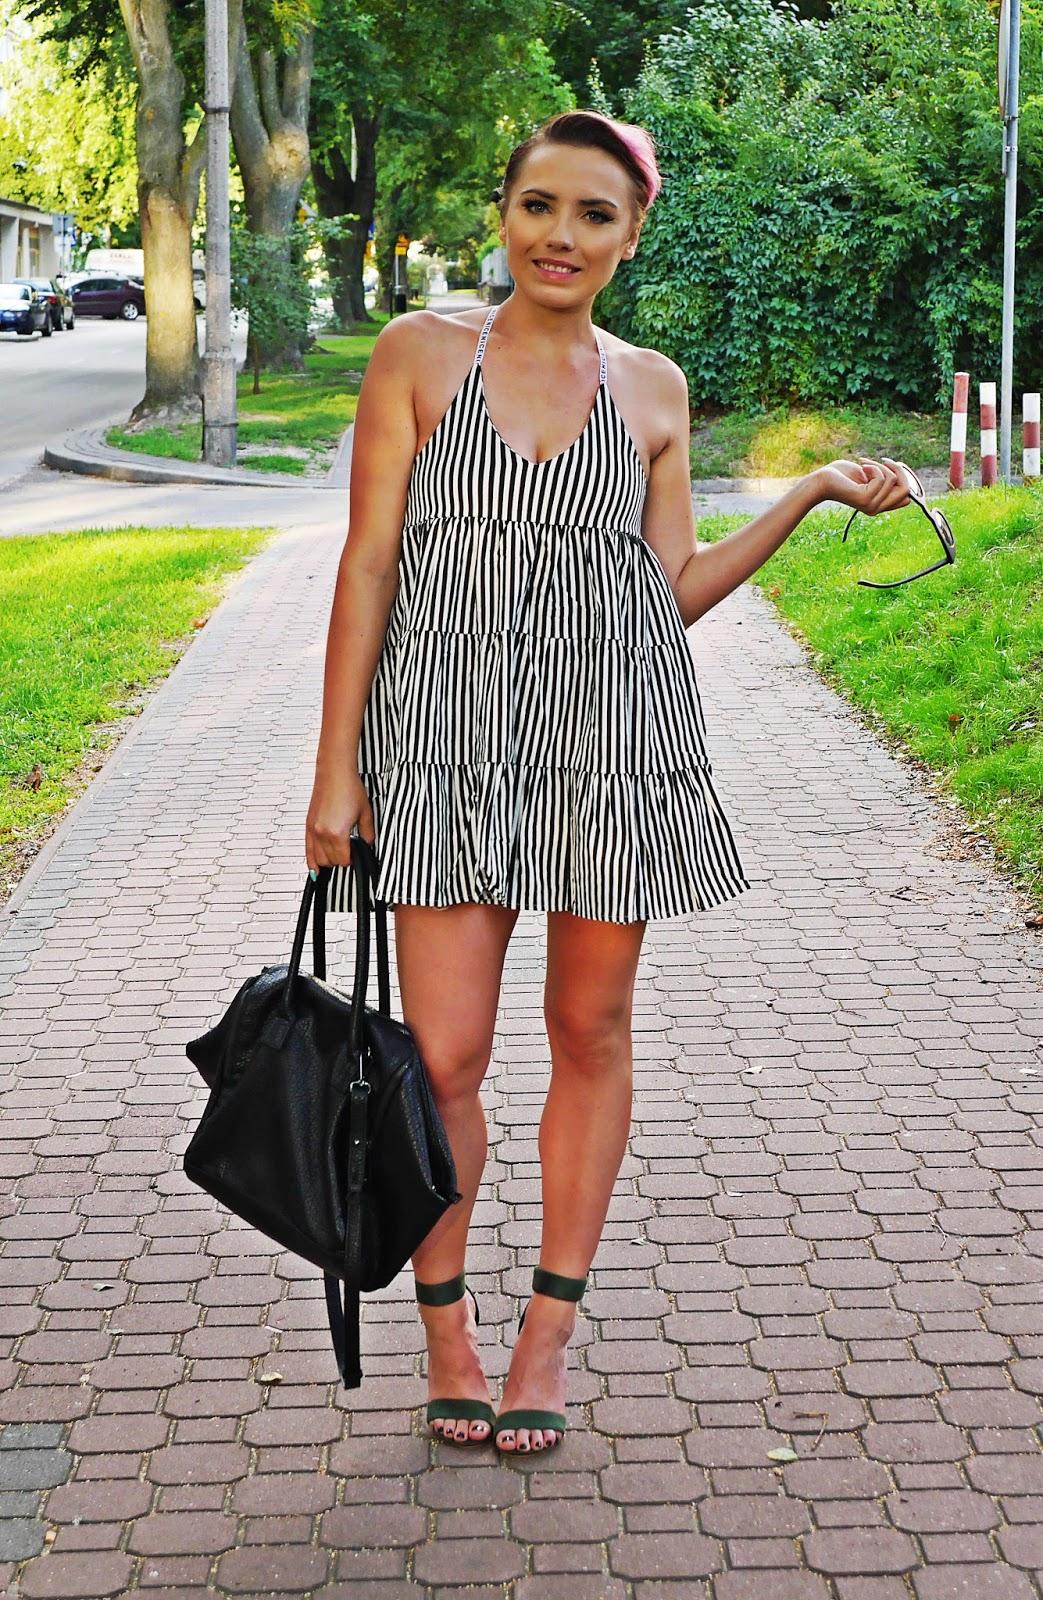 stripes_dress_green_heels_ootd_look_karyn_blog_010817d